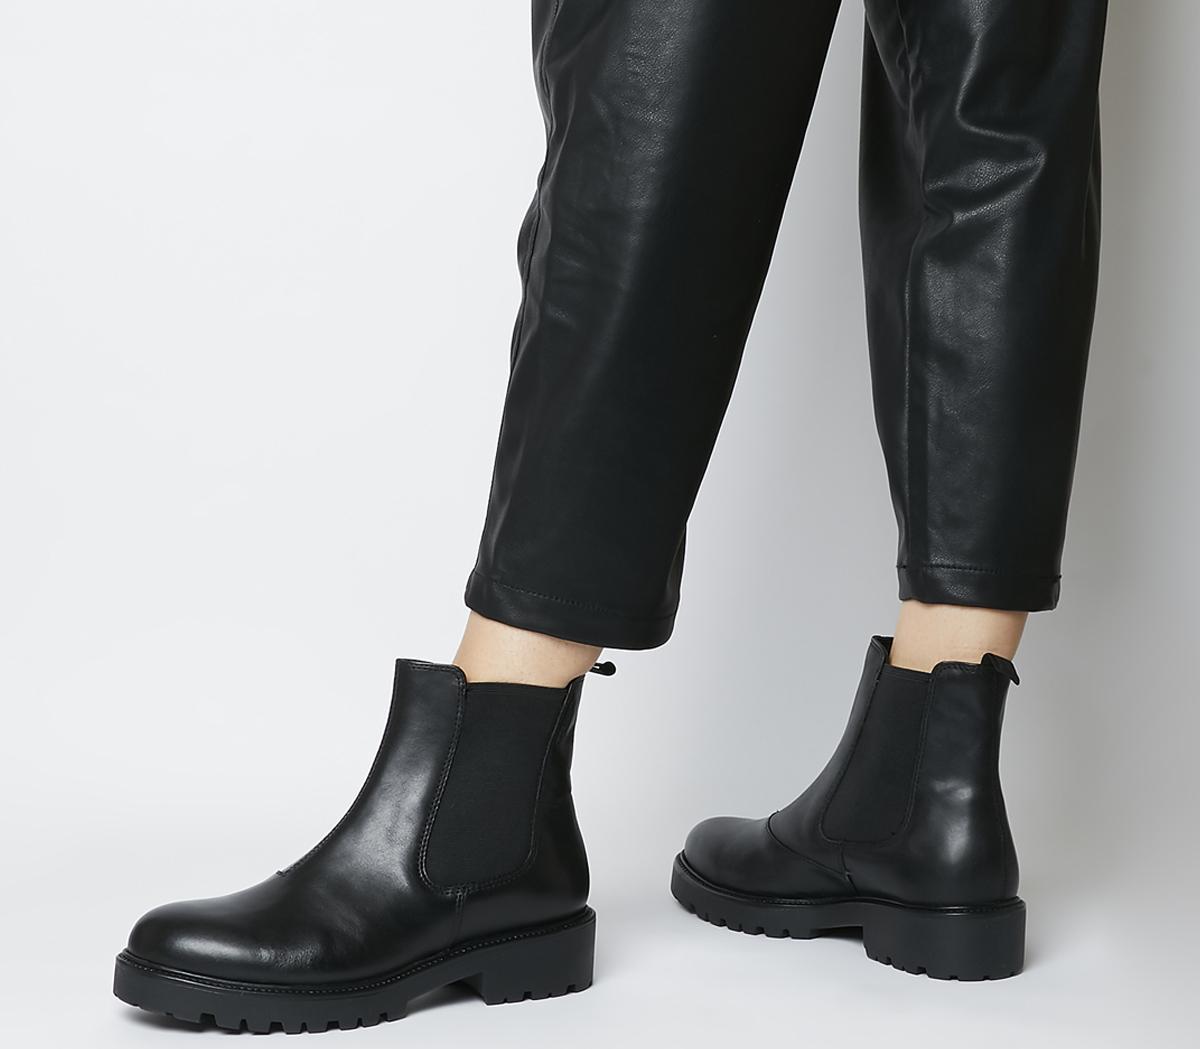 Vagabond Kenova Chelsea Boots Black